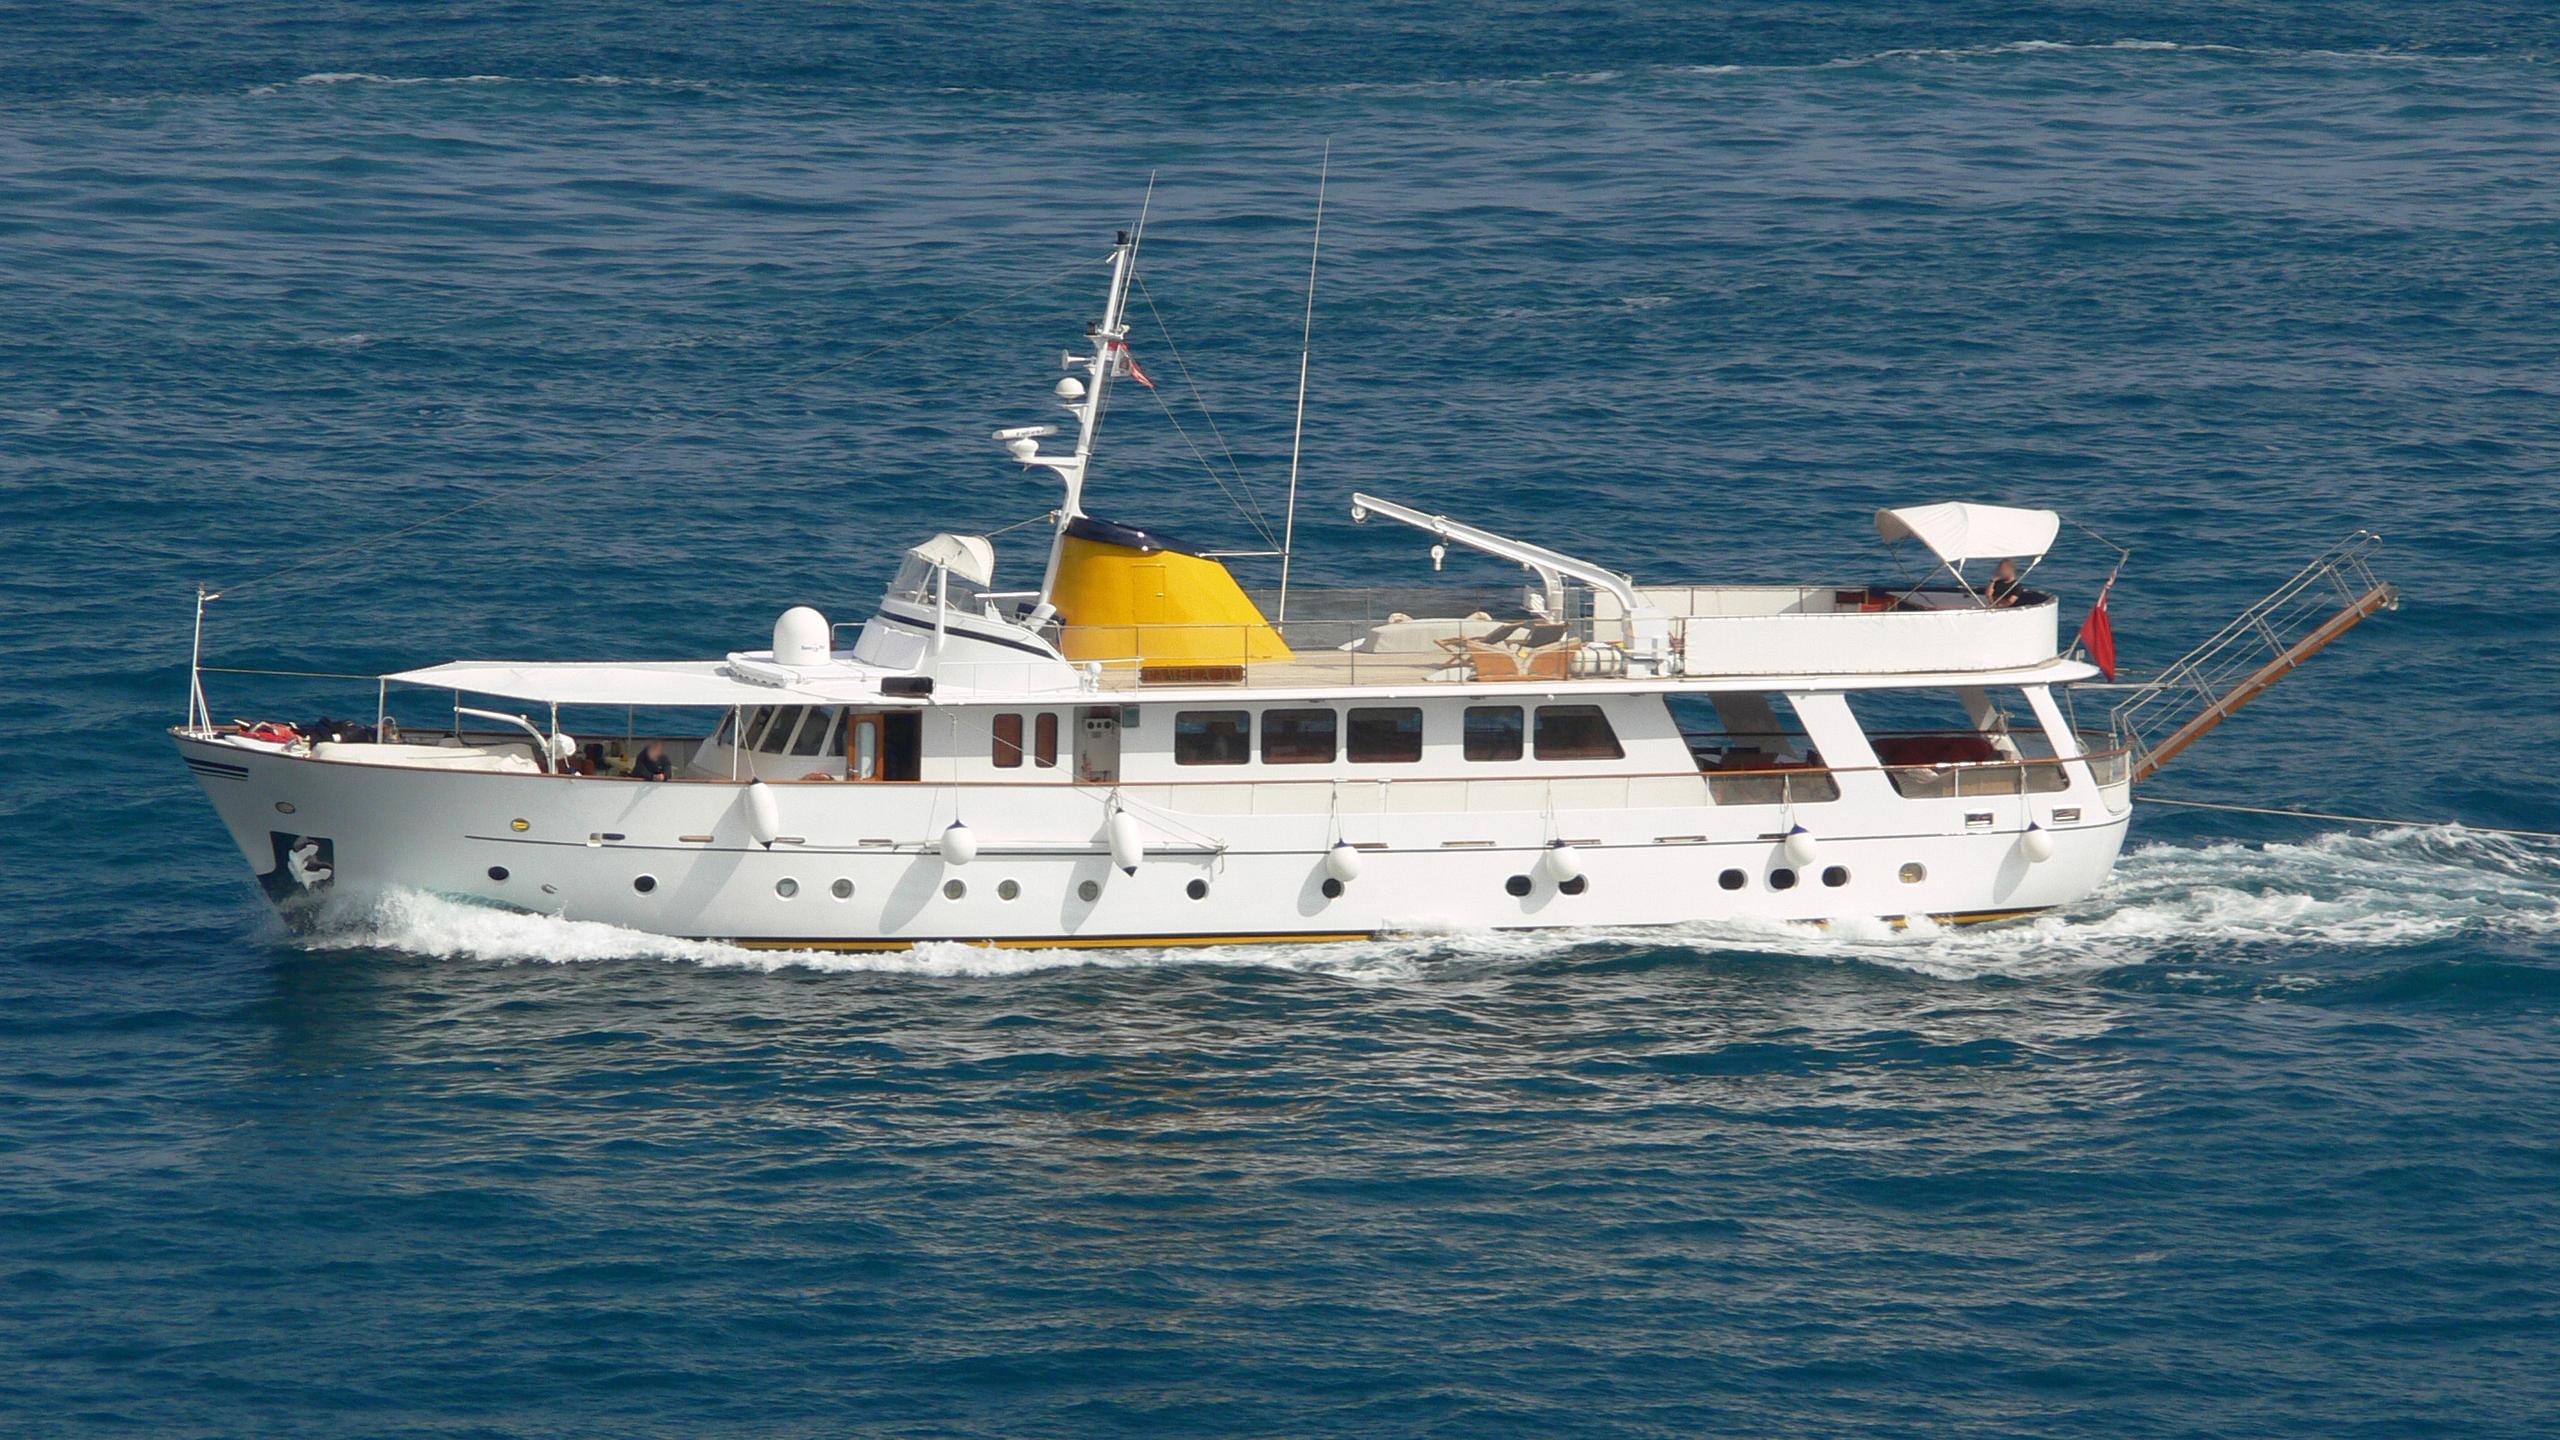 pamela-iv-of-london-classic-motor-yacht-cnl-liguri-1962-31m-running-profile